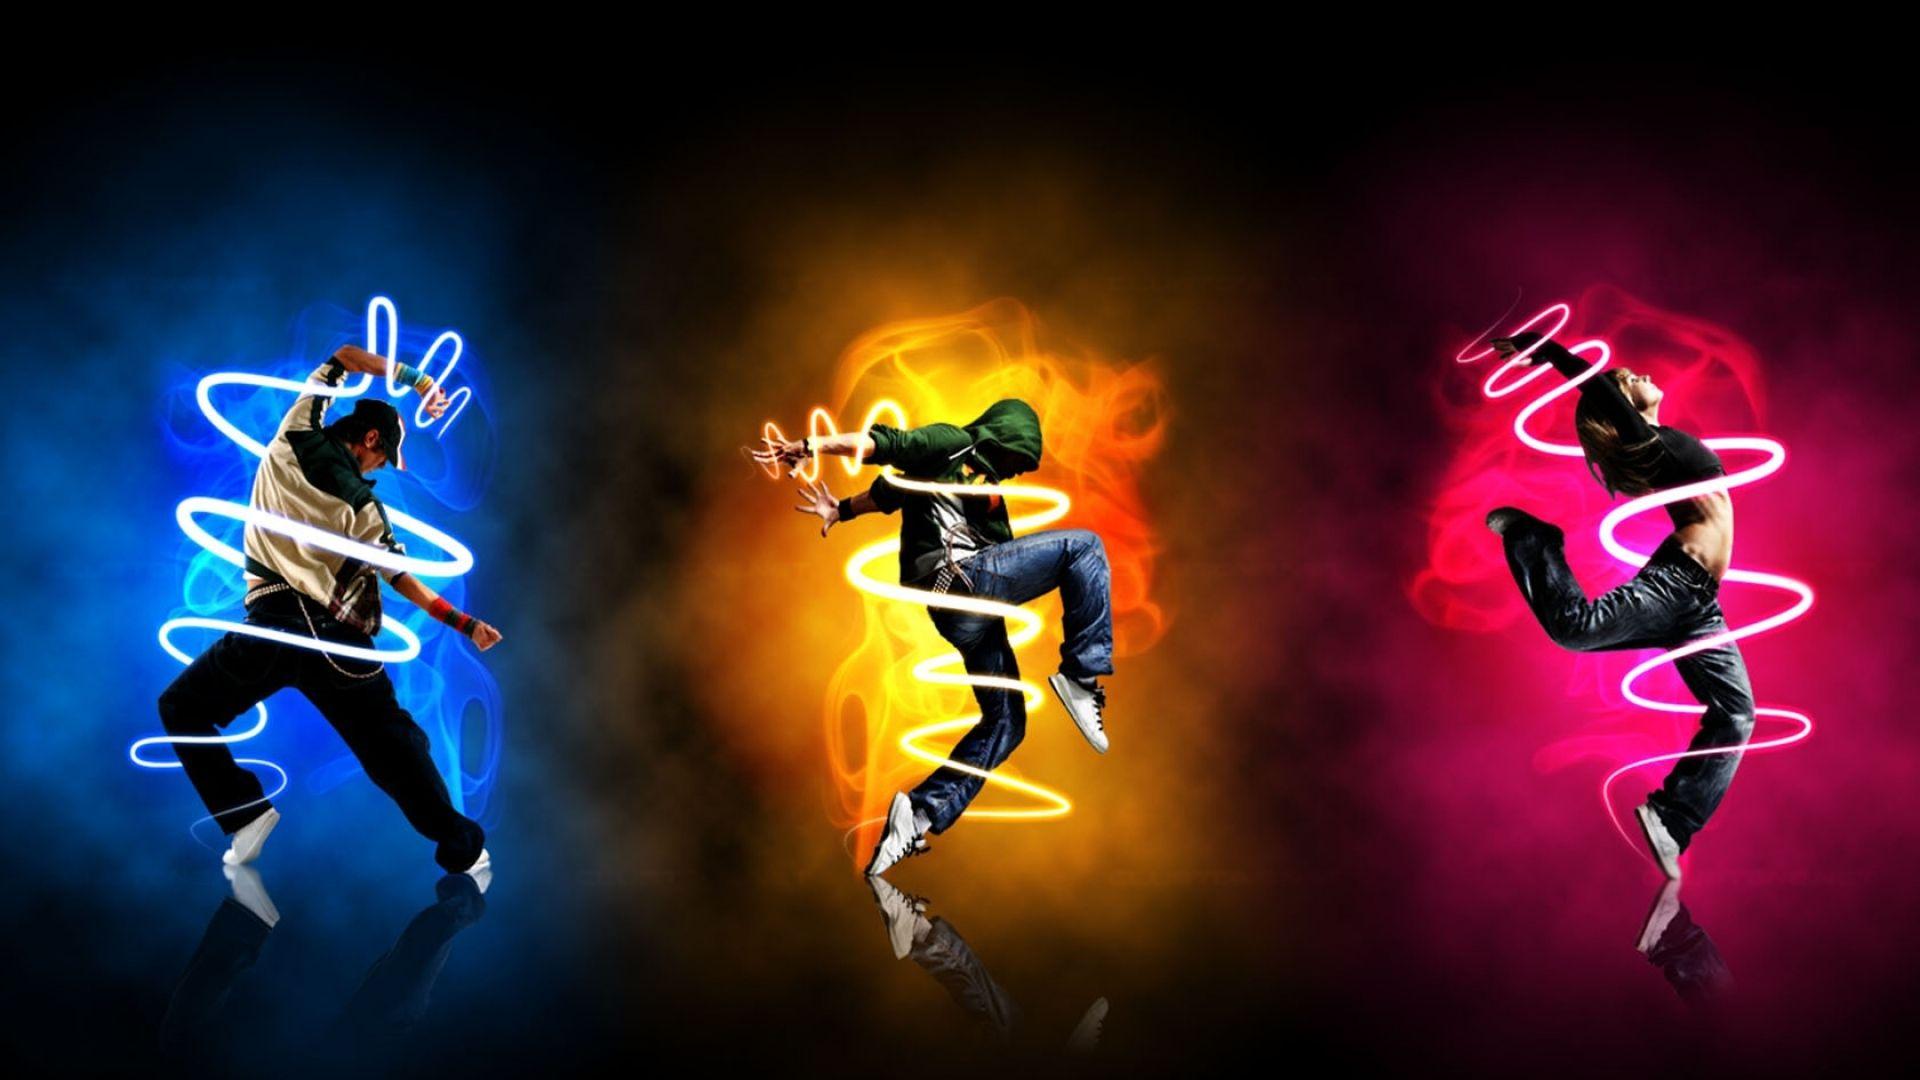 Free download dancer k ultra hd wallpapers of bsnscb